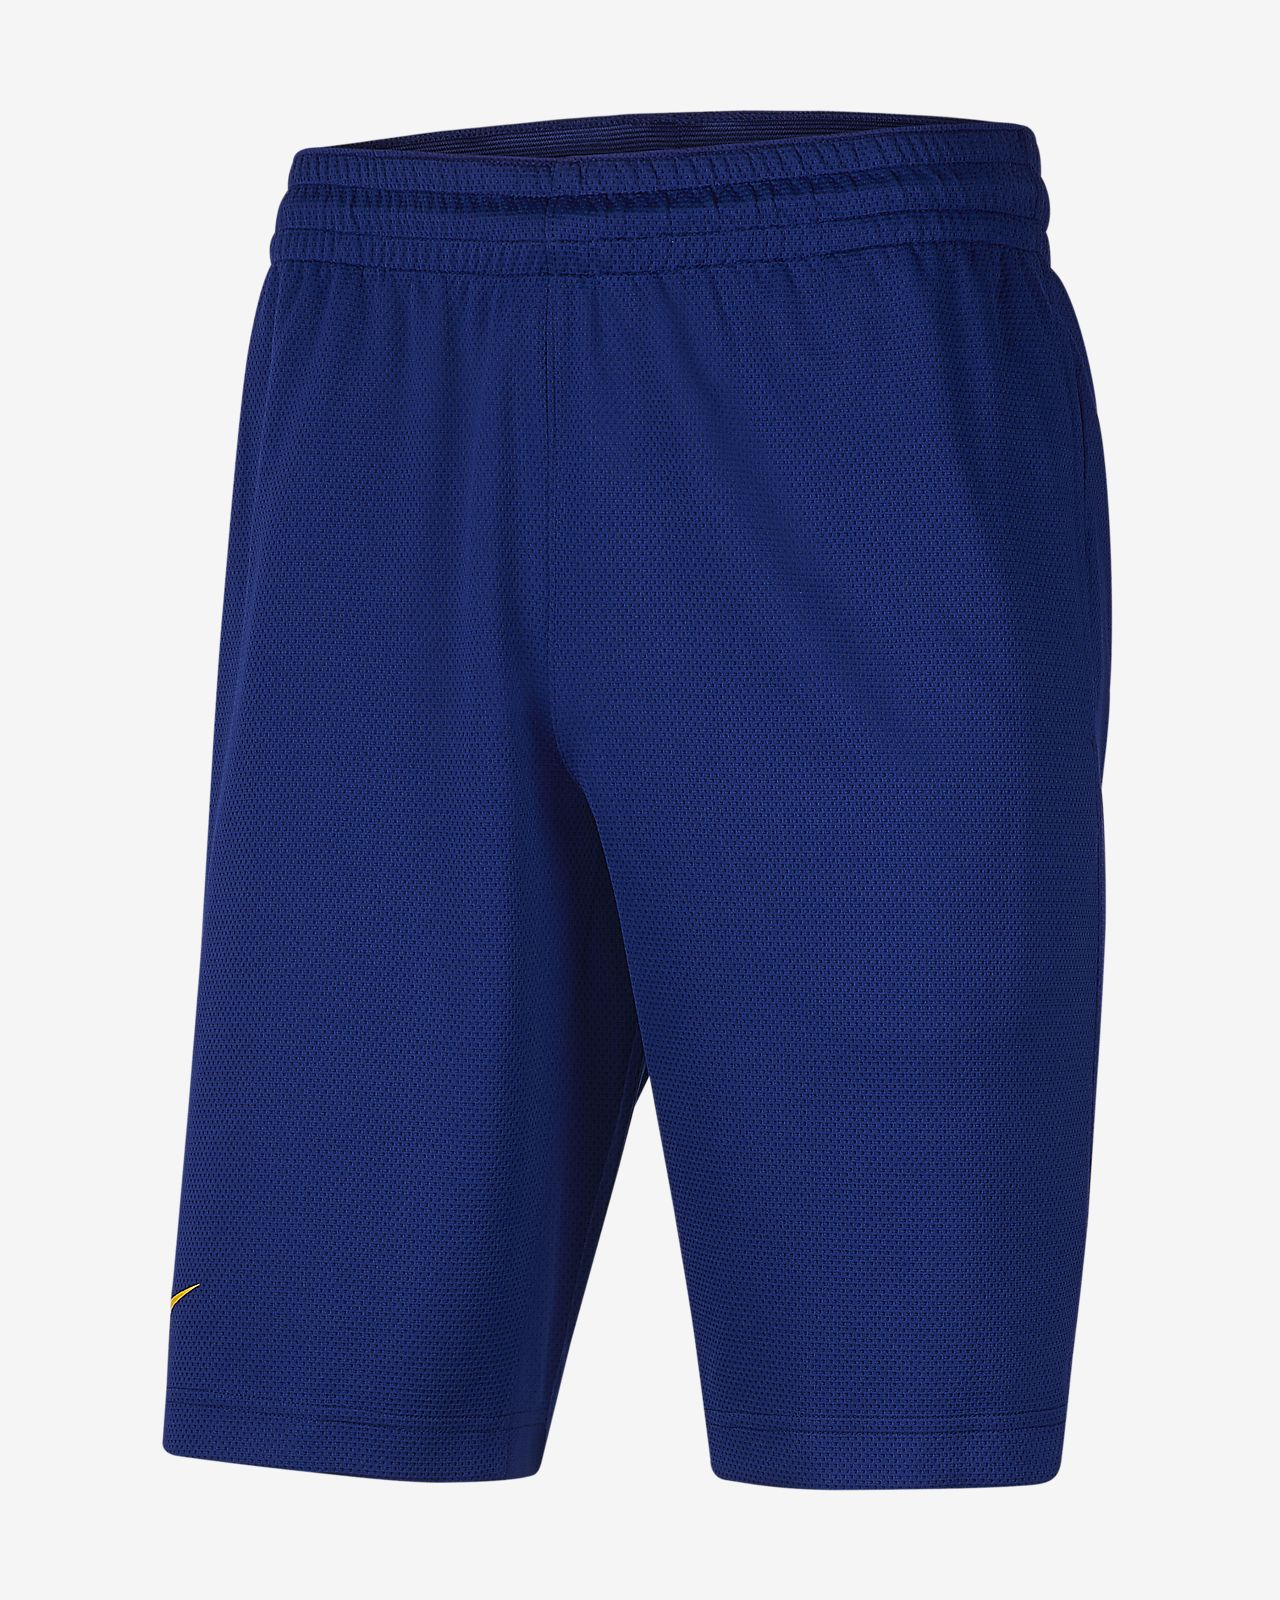 FC Barcelona Home Men's Replica Shorts